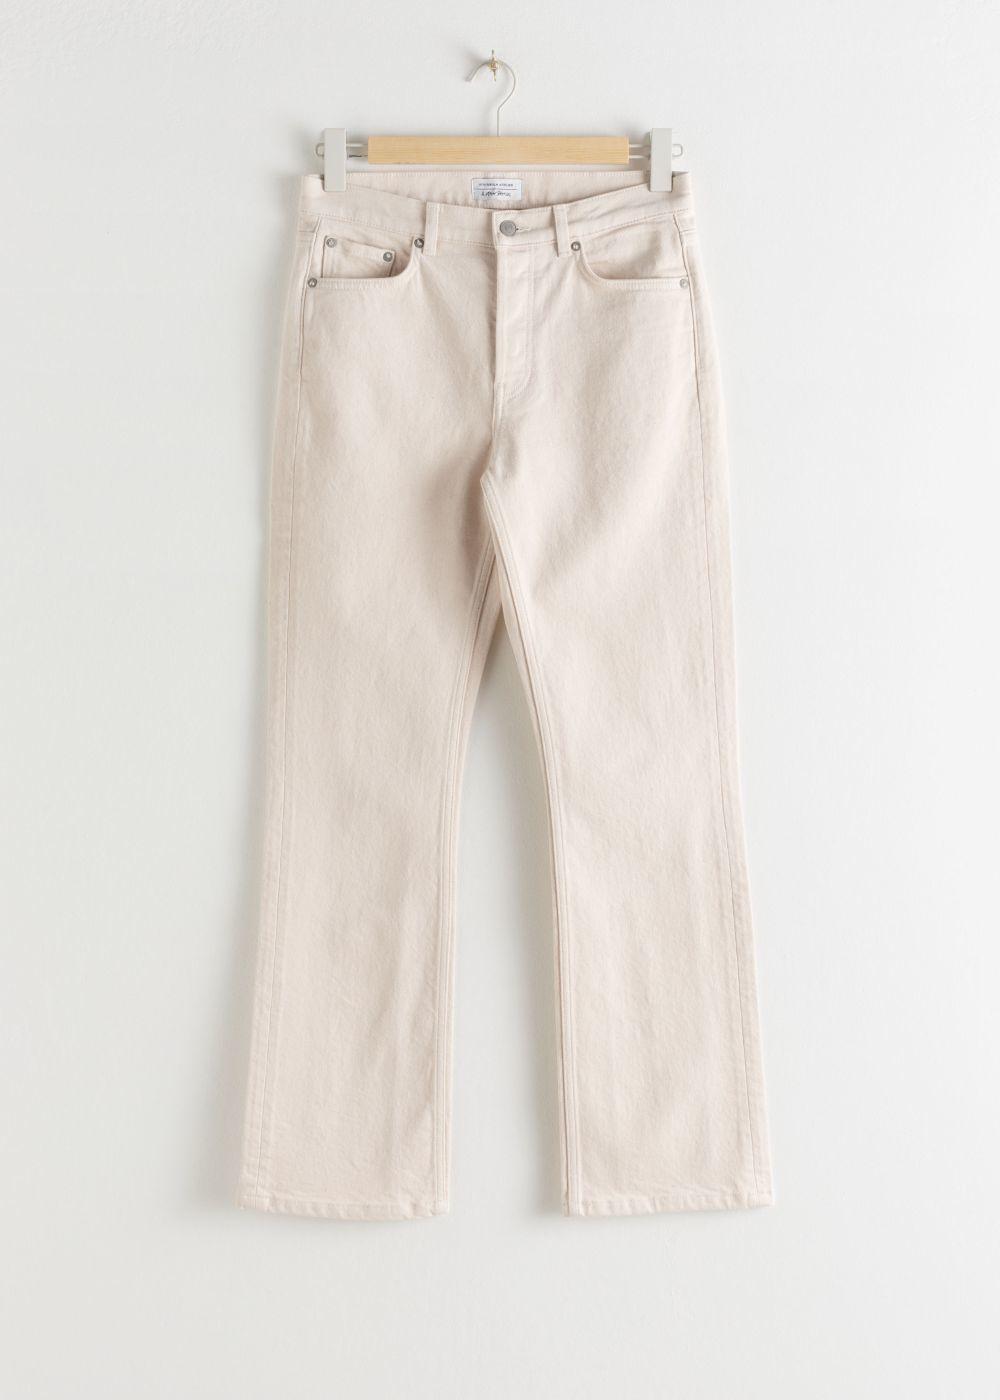 Jeans blancos, de &Other Stories